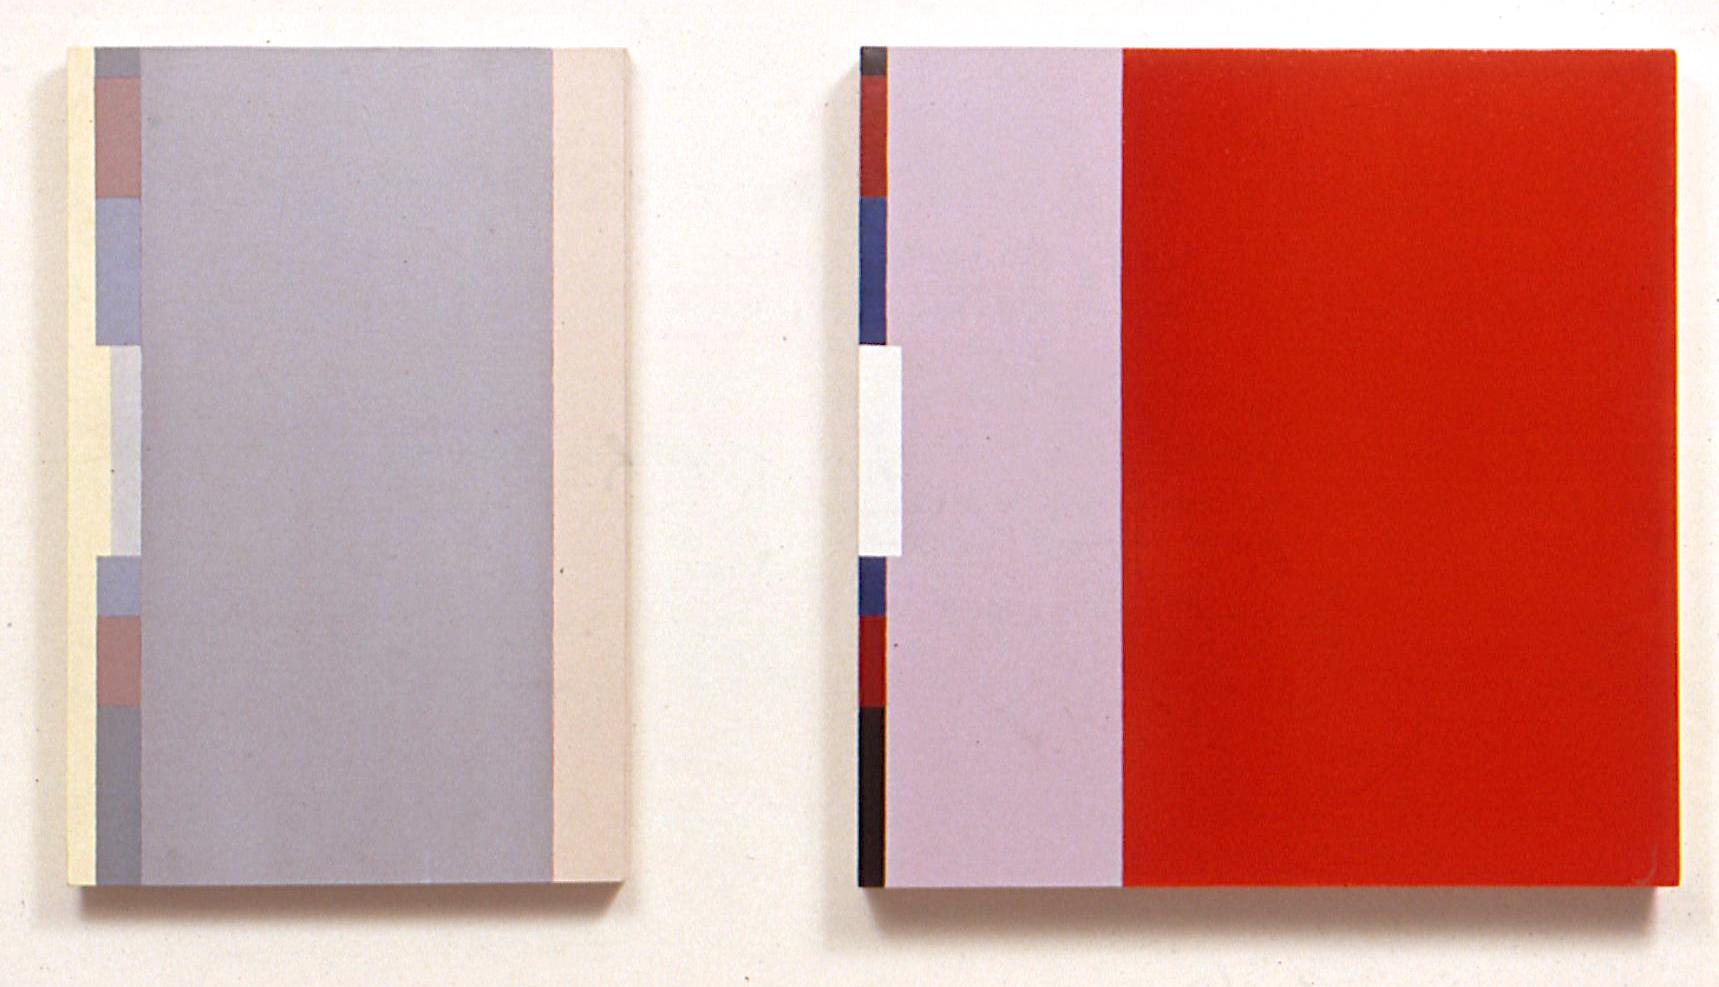 "Fog, 1990. Oil on linen. ditych 28""x19""x2.5"", 28""x28""x3.5"""